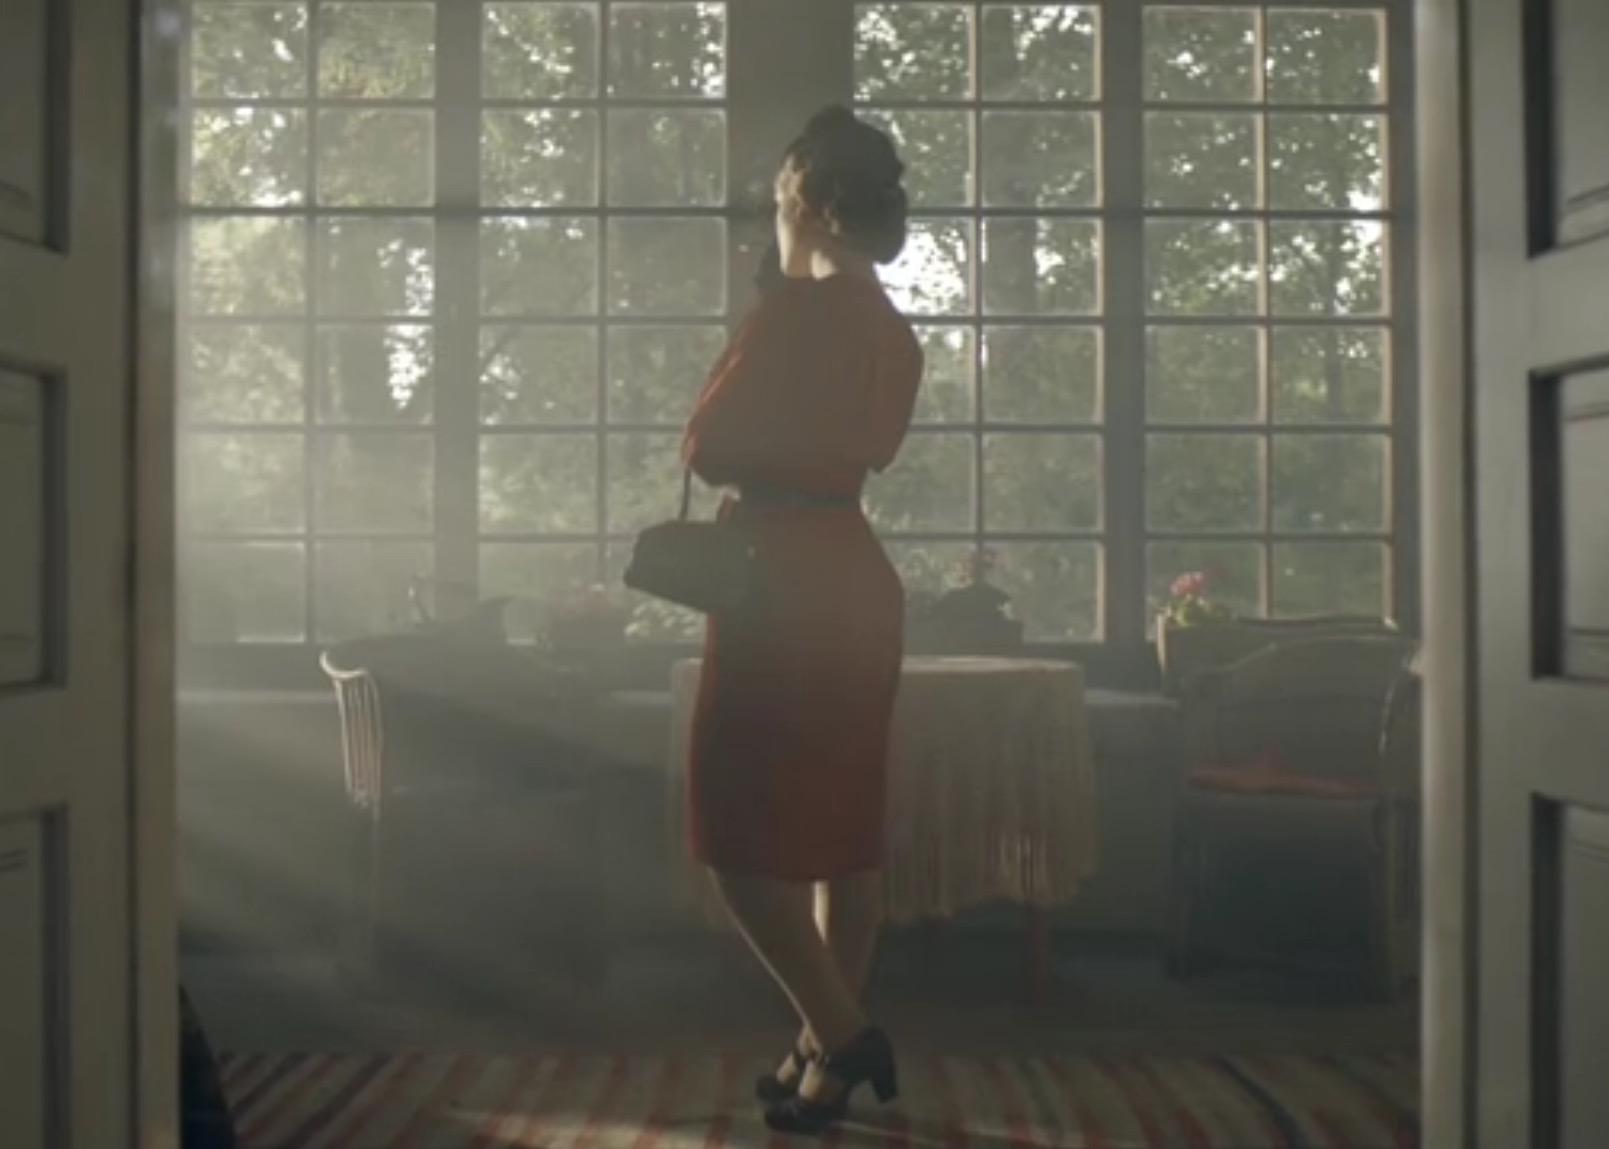 THE DAYS OF HONOUR 6 Trailer 30 // CZAS HONORU 6 Zwiastun 30